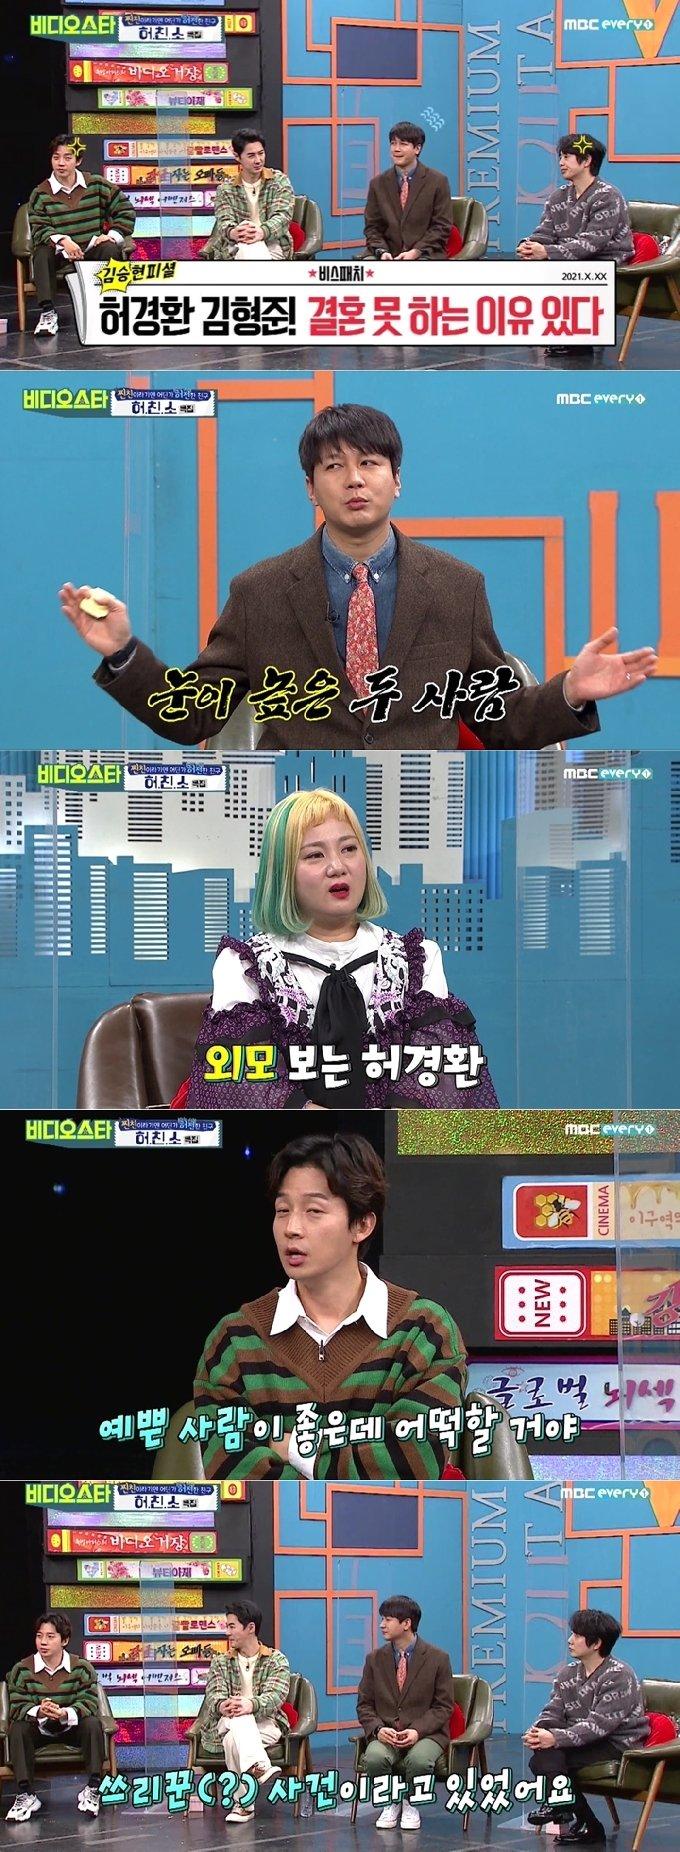 MBC에브리원 '비디오스타' 방송화면 갈무리 © 뉴스1